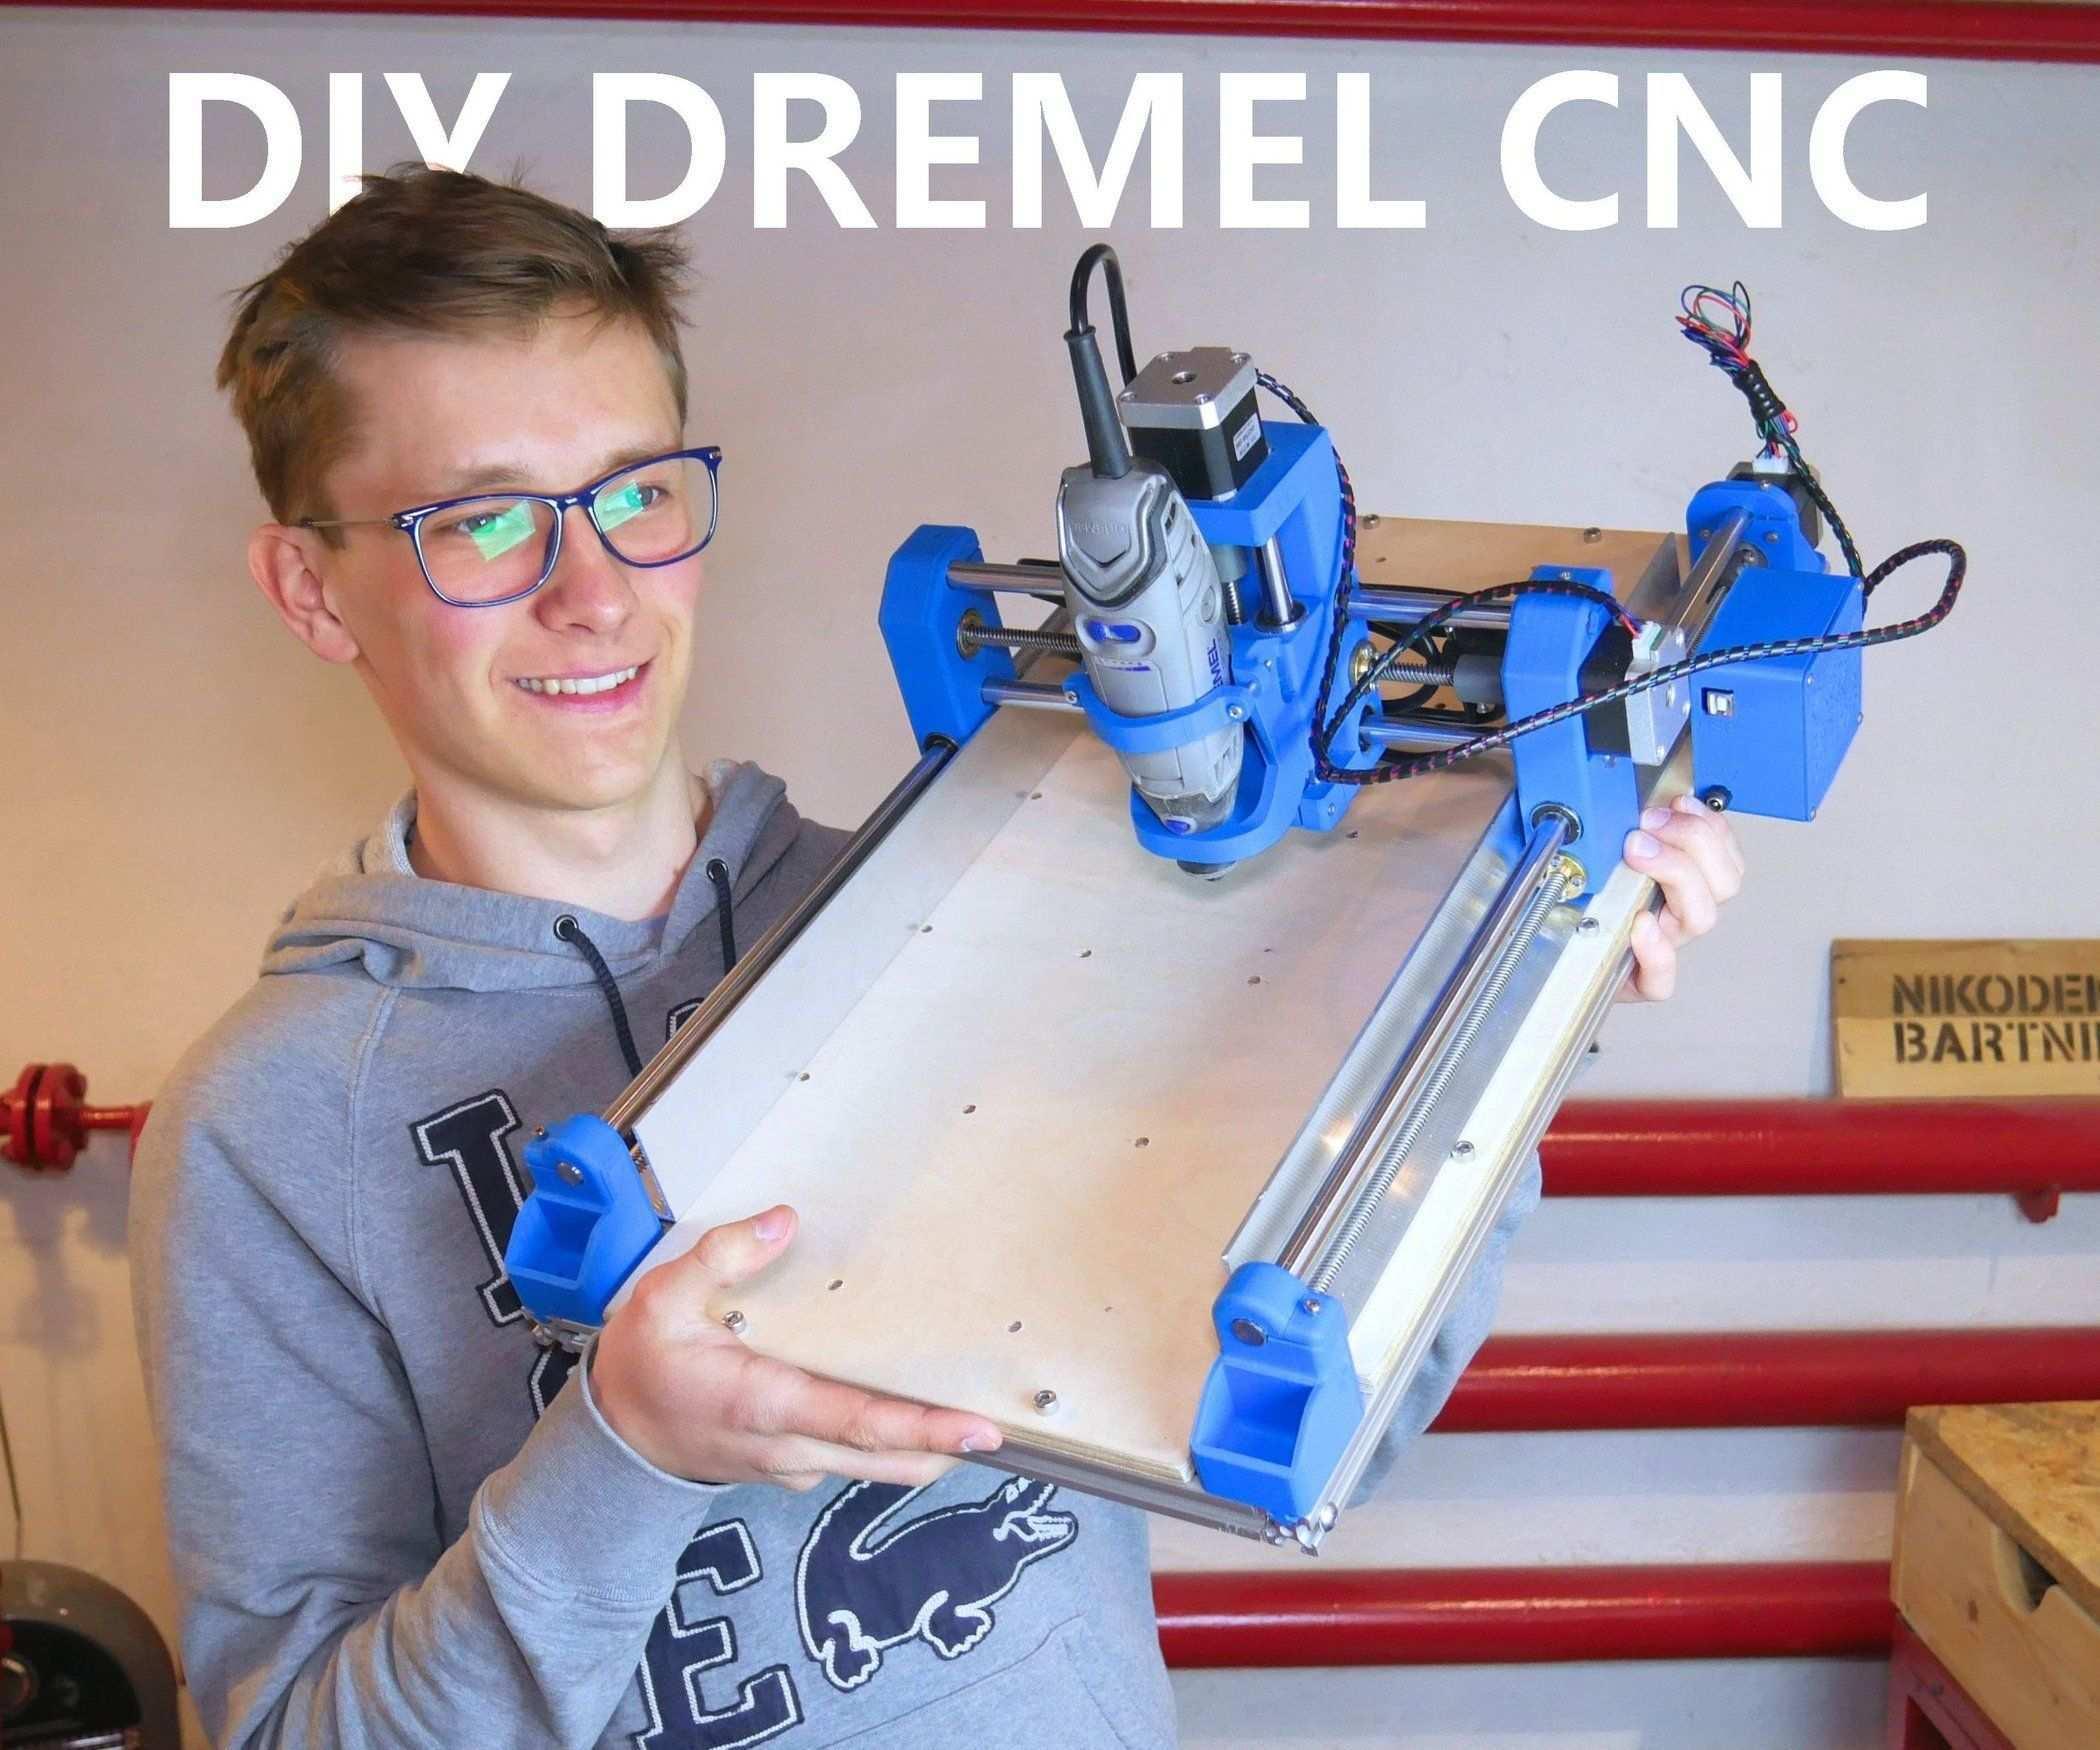 Diy 3d Printed Dremel Cnc Dremel Cnc Dremel Bits